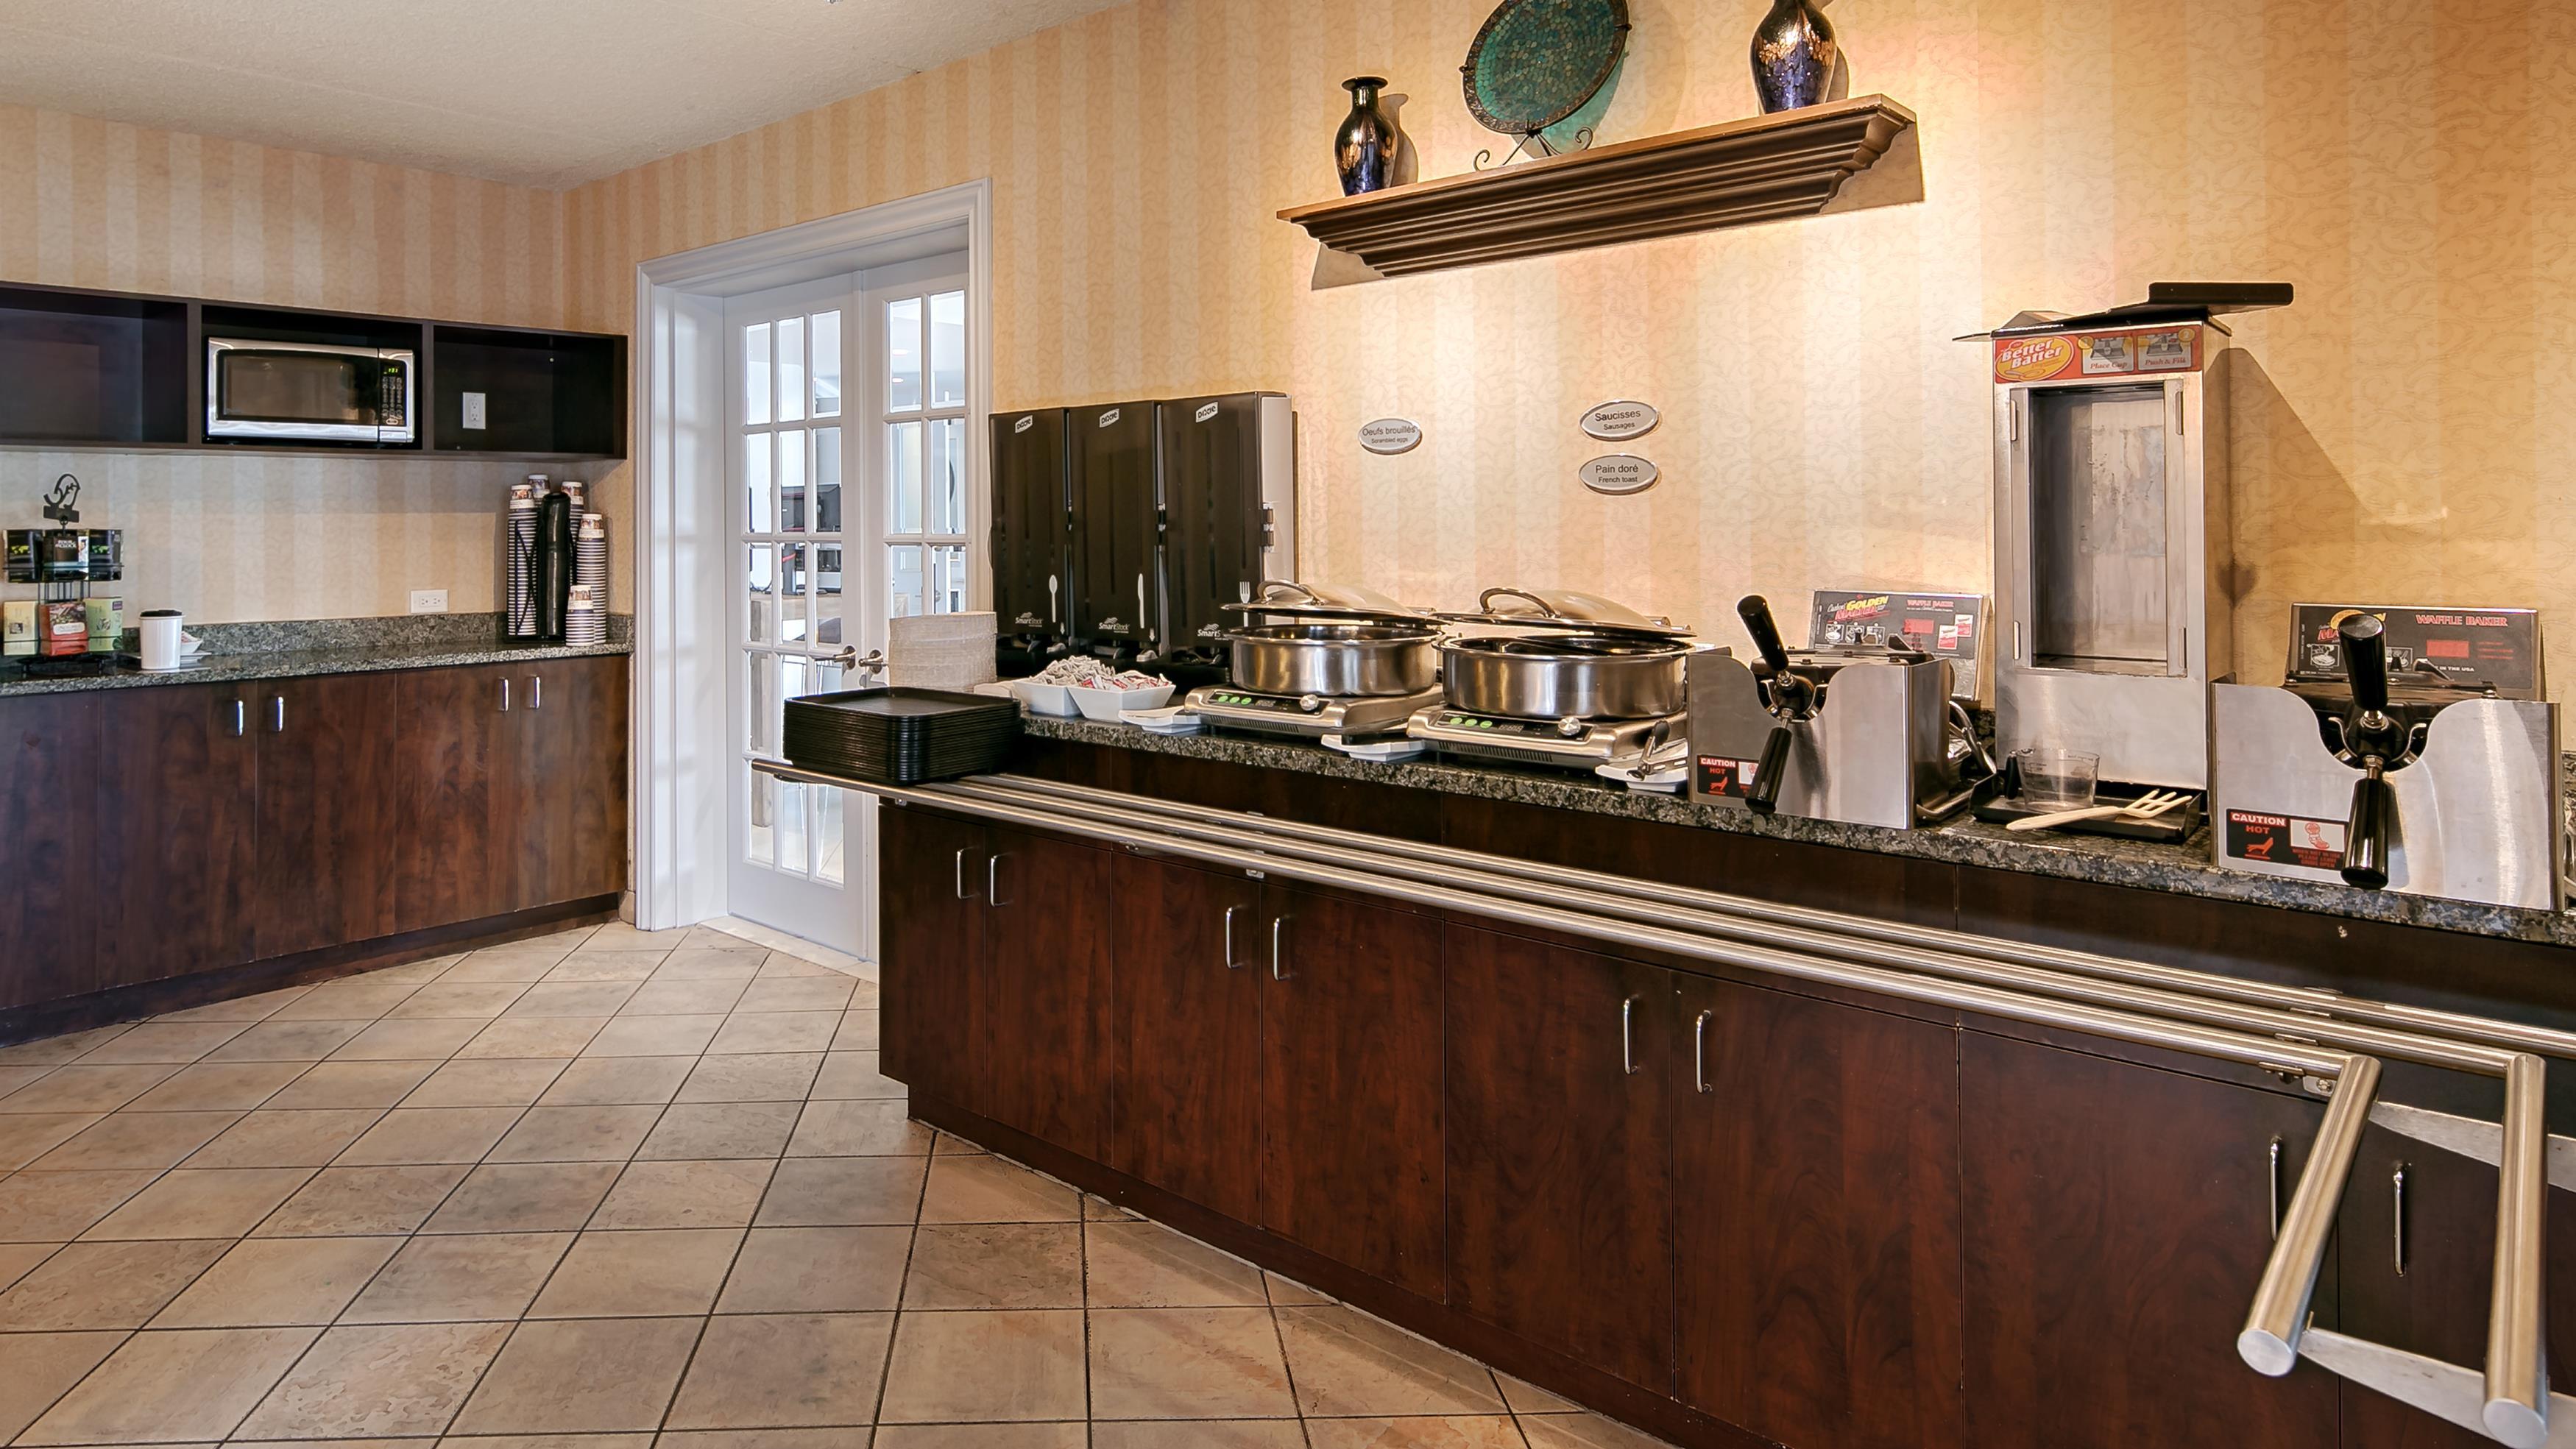 Best Western Hotel Brossard à Brossard: Breakfast Area